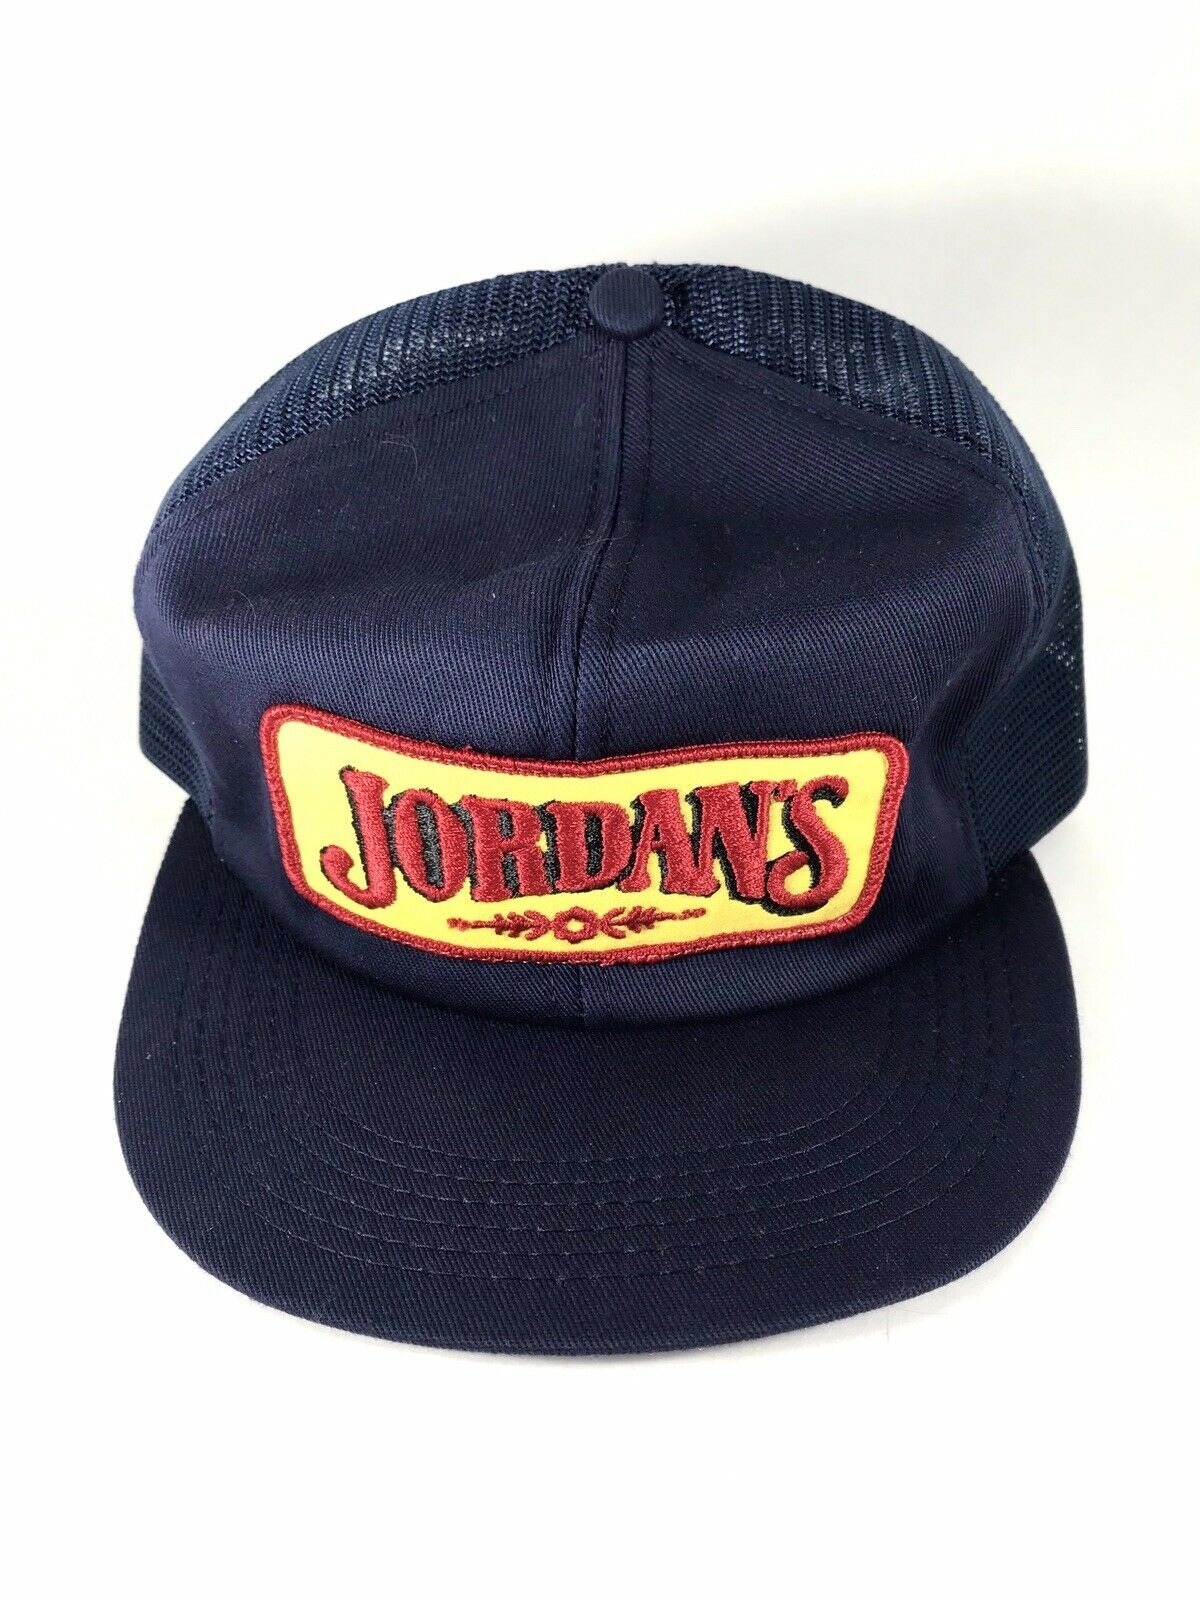 Vintage Jordan's Mesh Trucker Hat Cap Snapback Maine Hotdogs Patch K Products